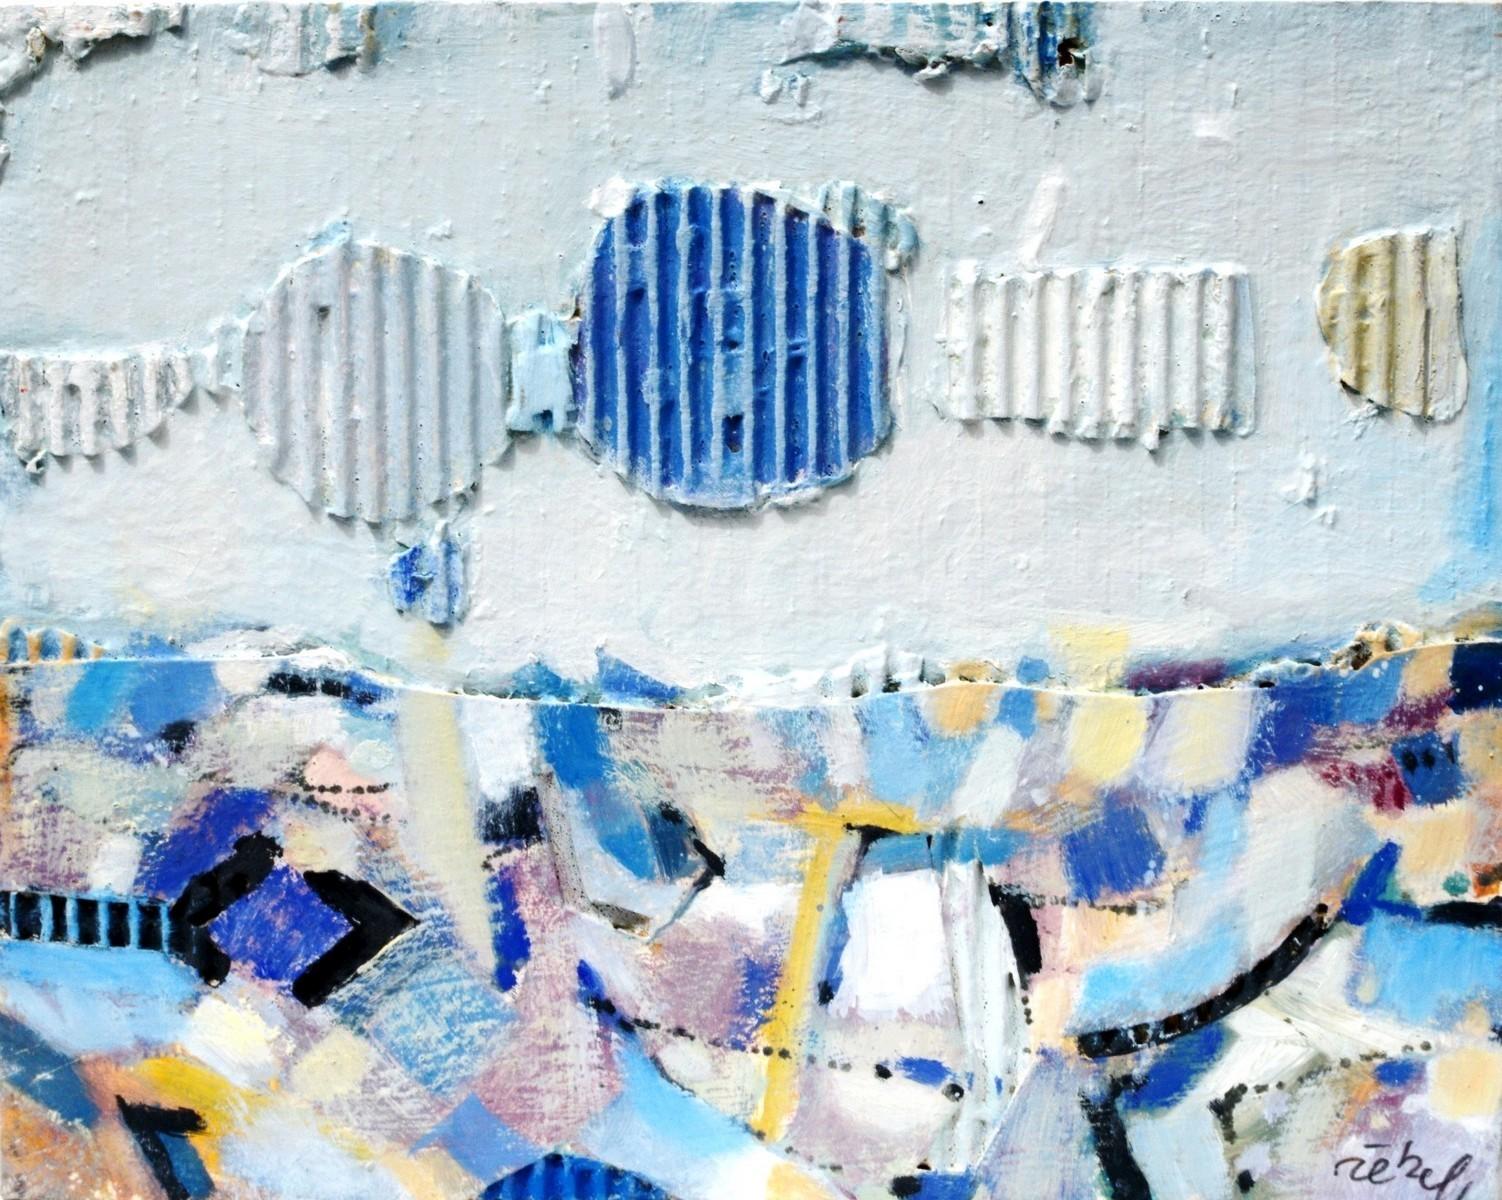 Collage o.T. - Rieckel, Helmut - k-06420